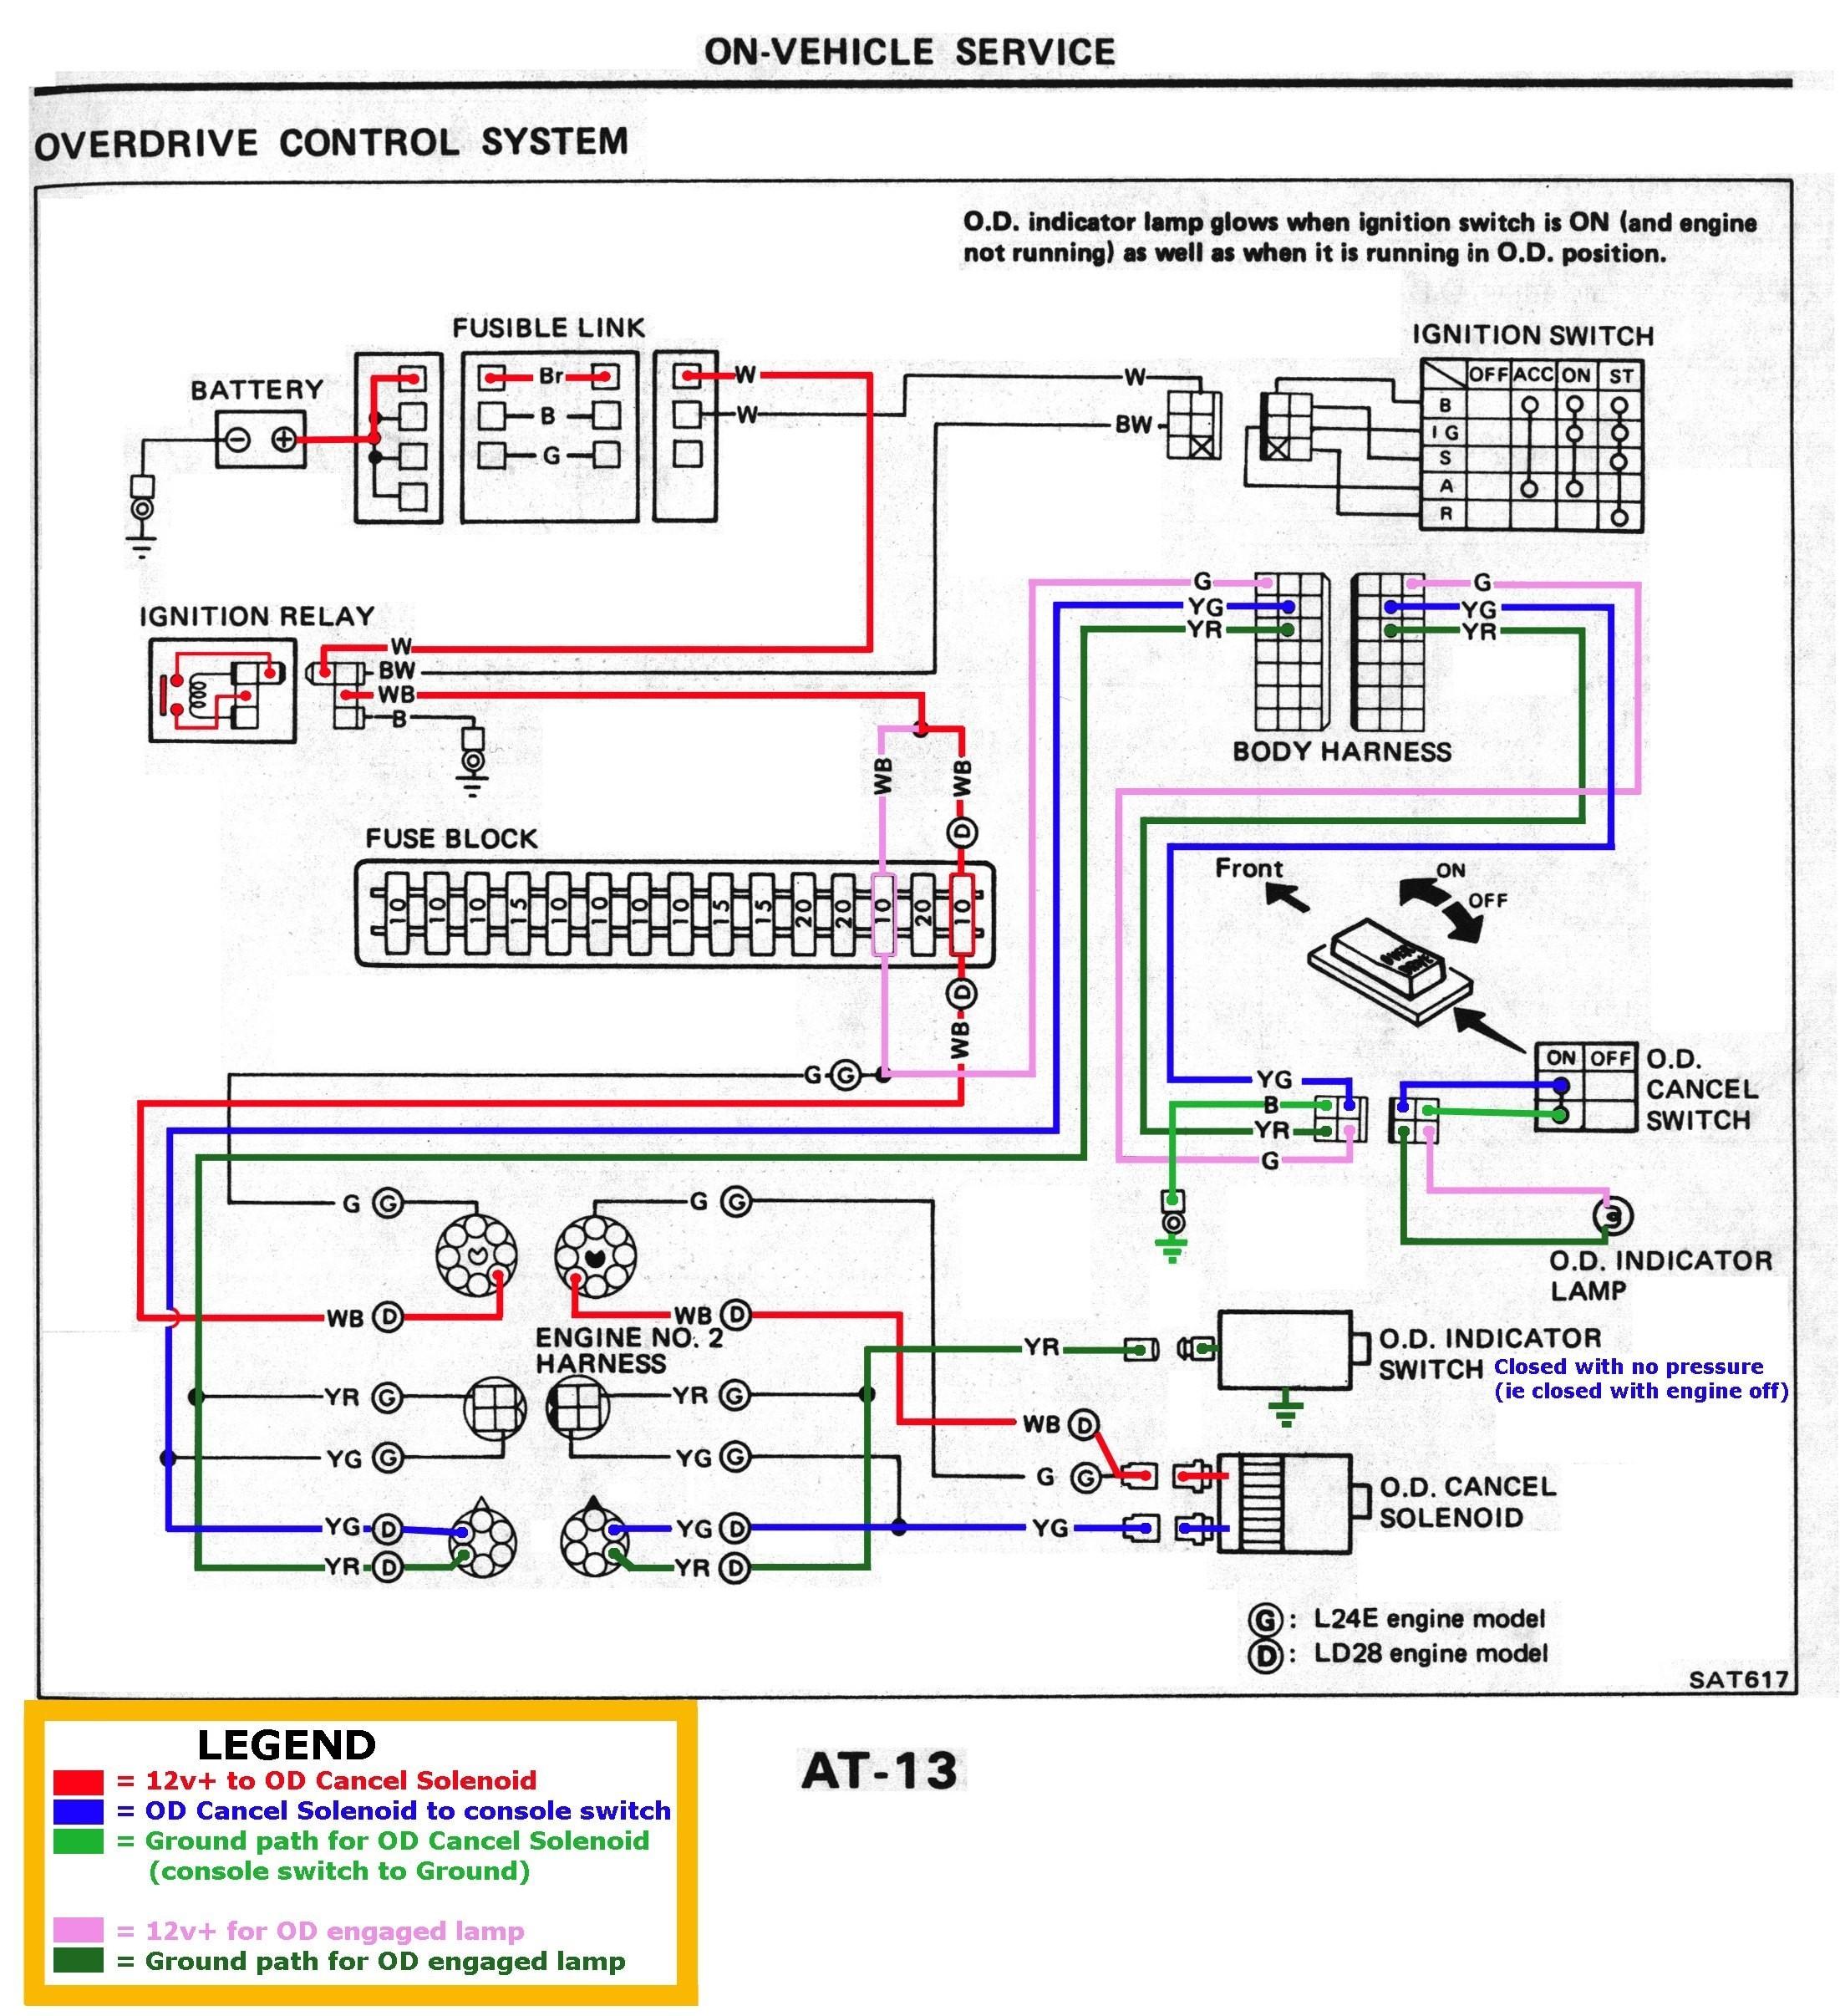 Nissan Altima Engine Diagram 571 Diagram 2004 Nissan Murano Engine Of Nissan Altima Engine Diagram